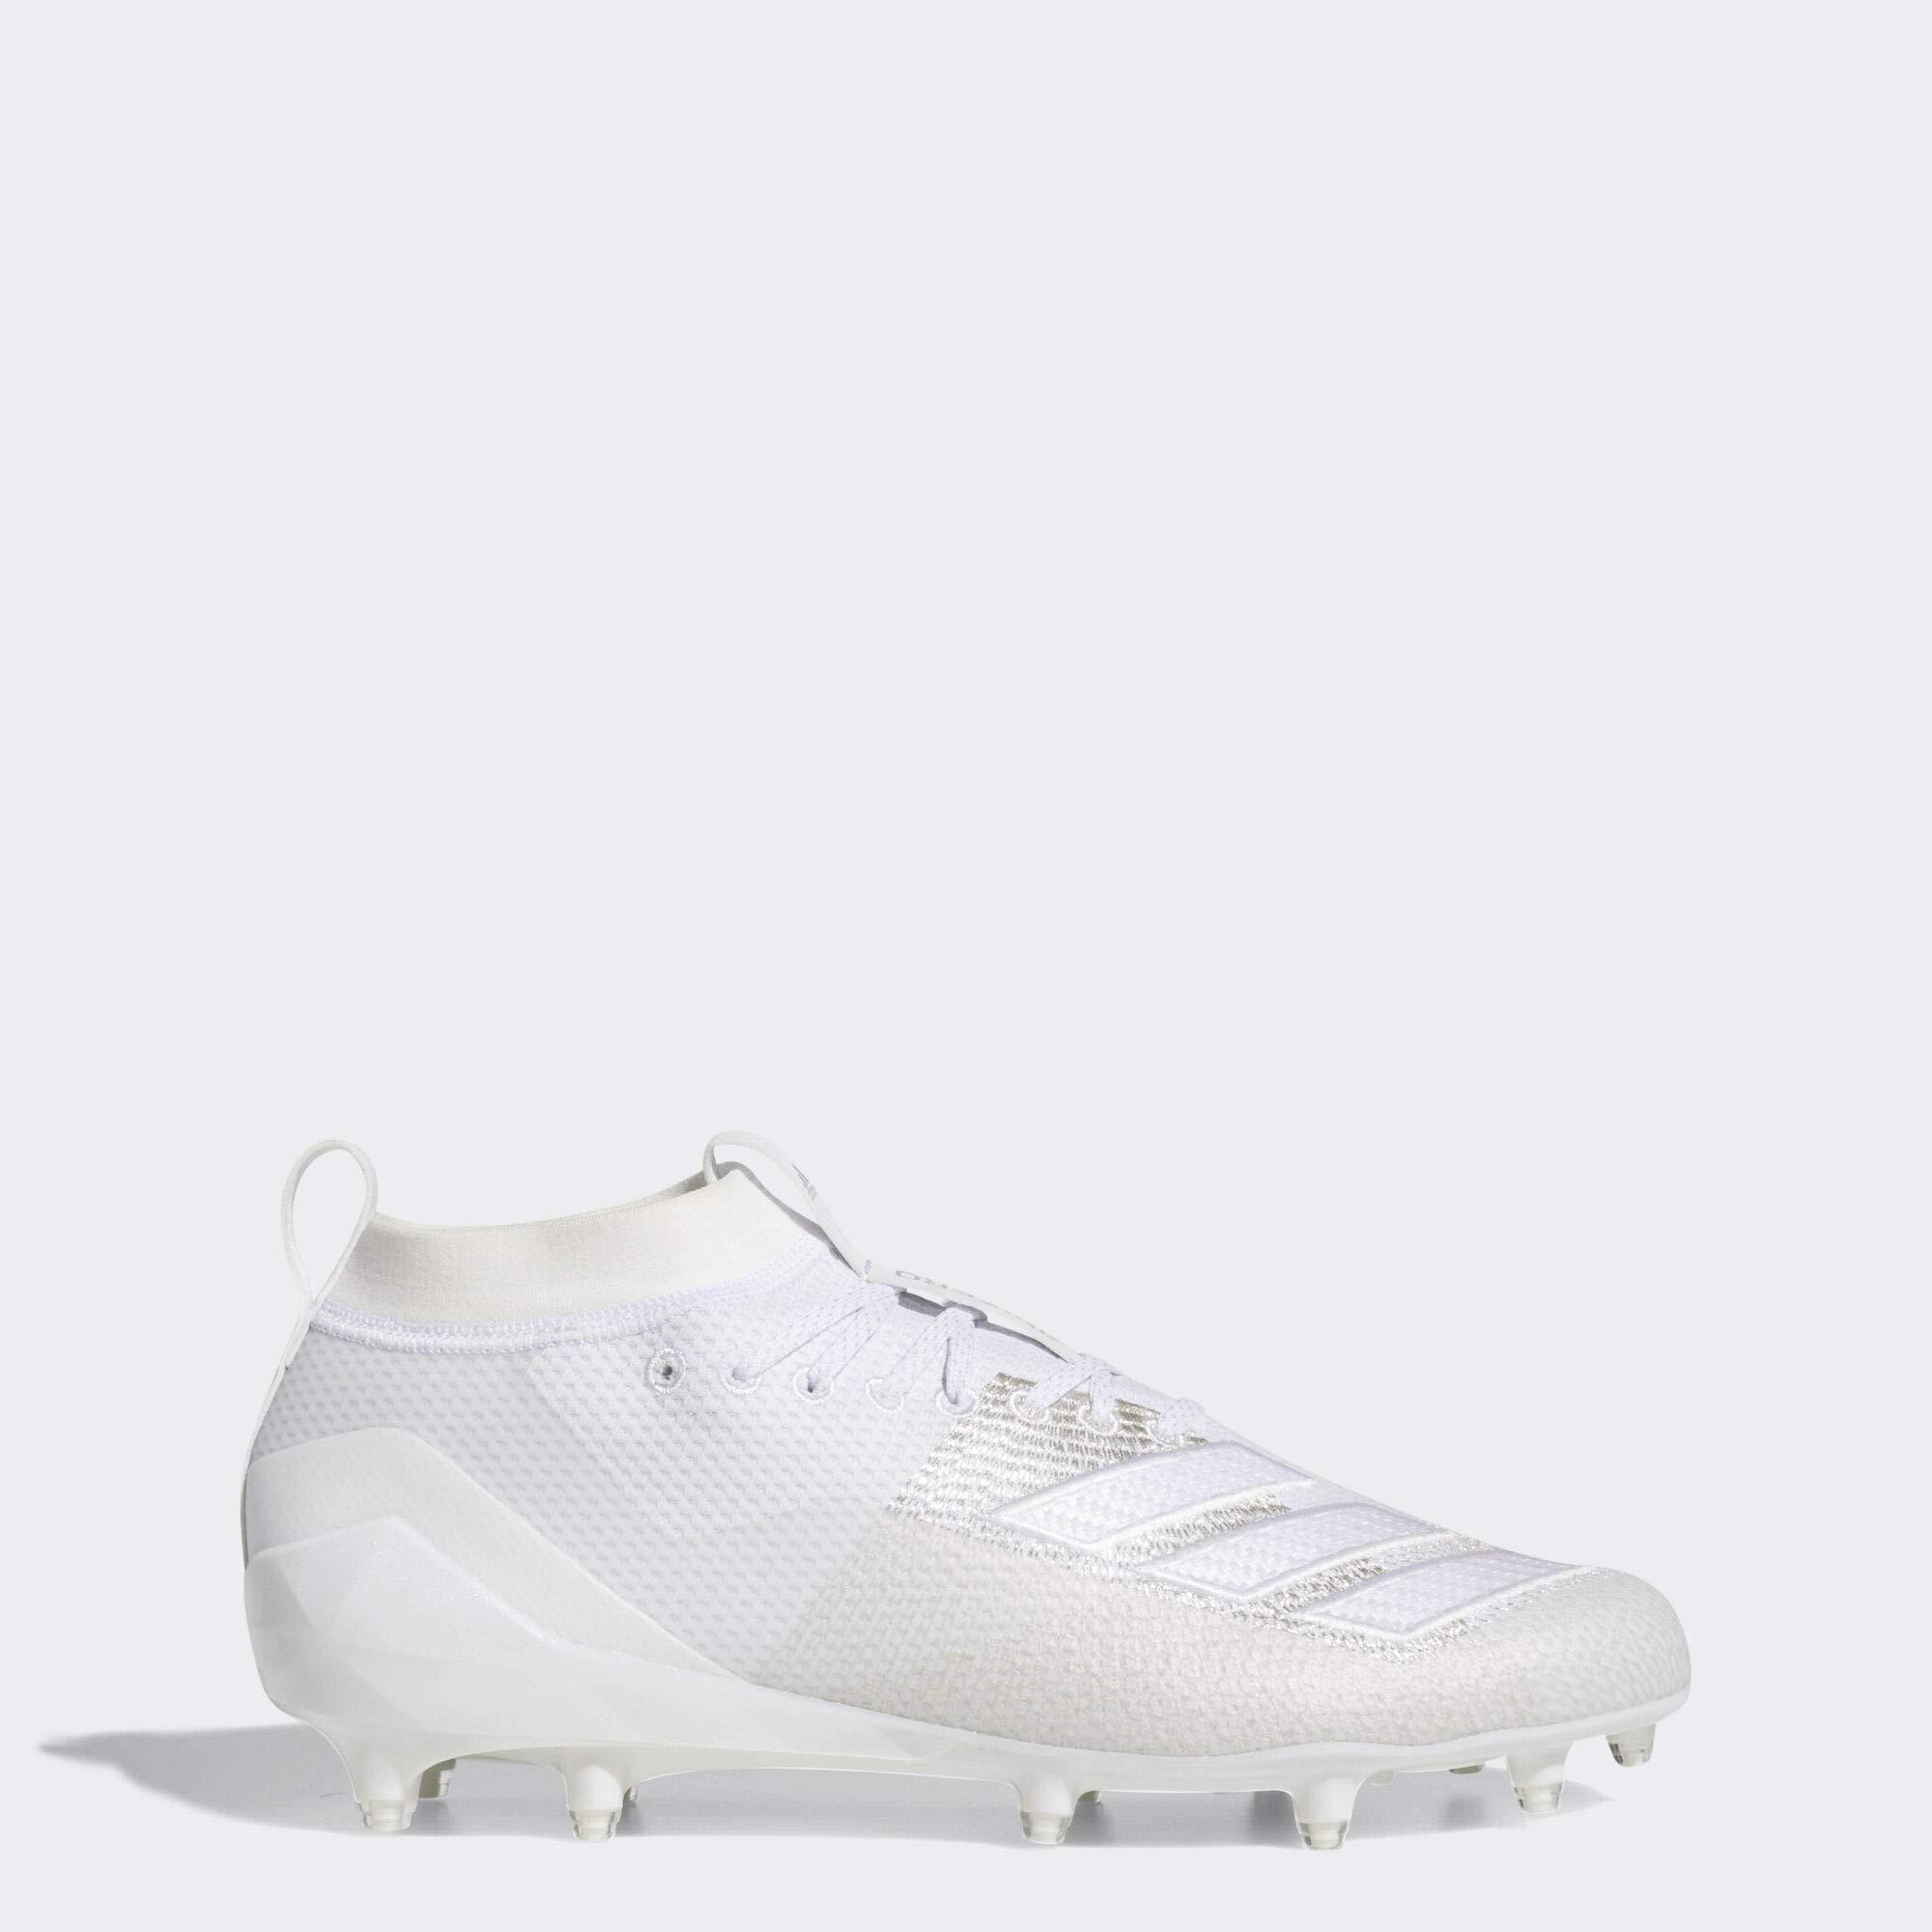 adidas Men's Adizero 8.0 Football Shoe, White, 10 M US by adidas